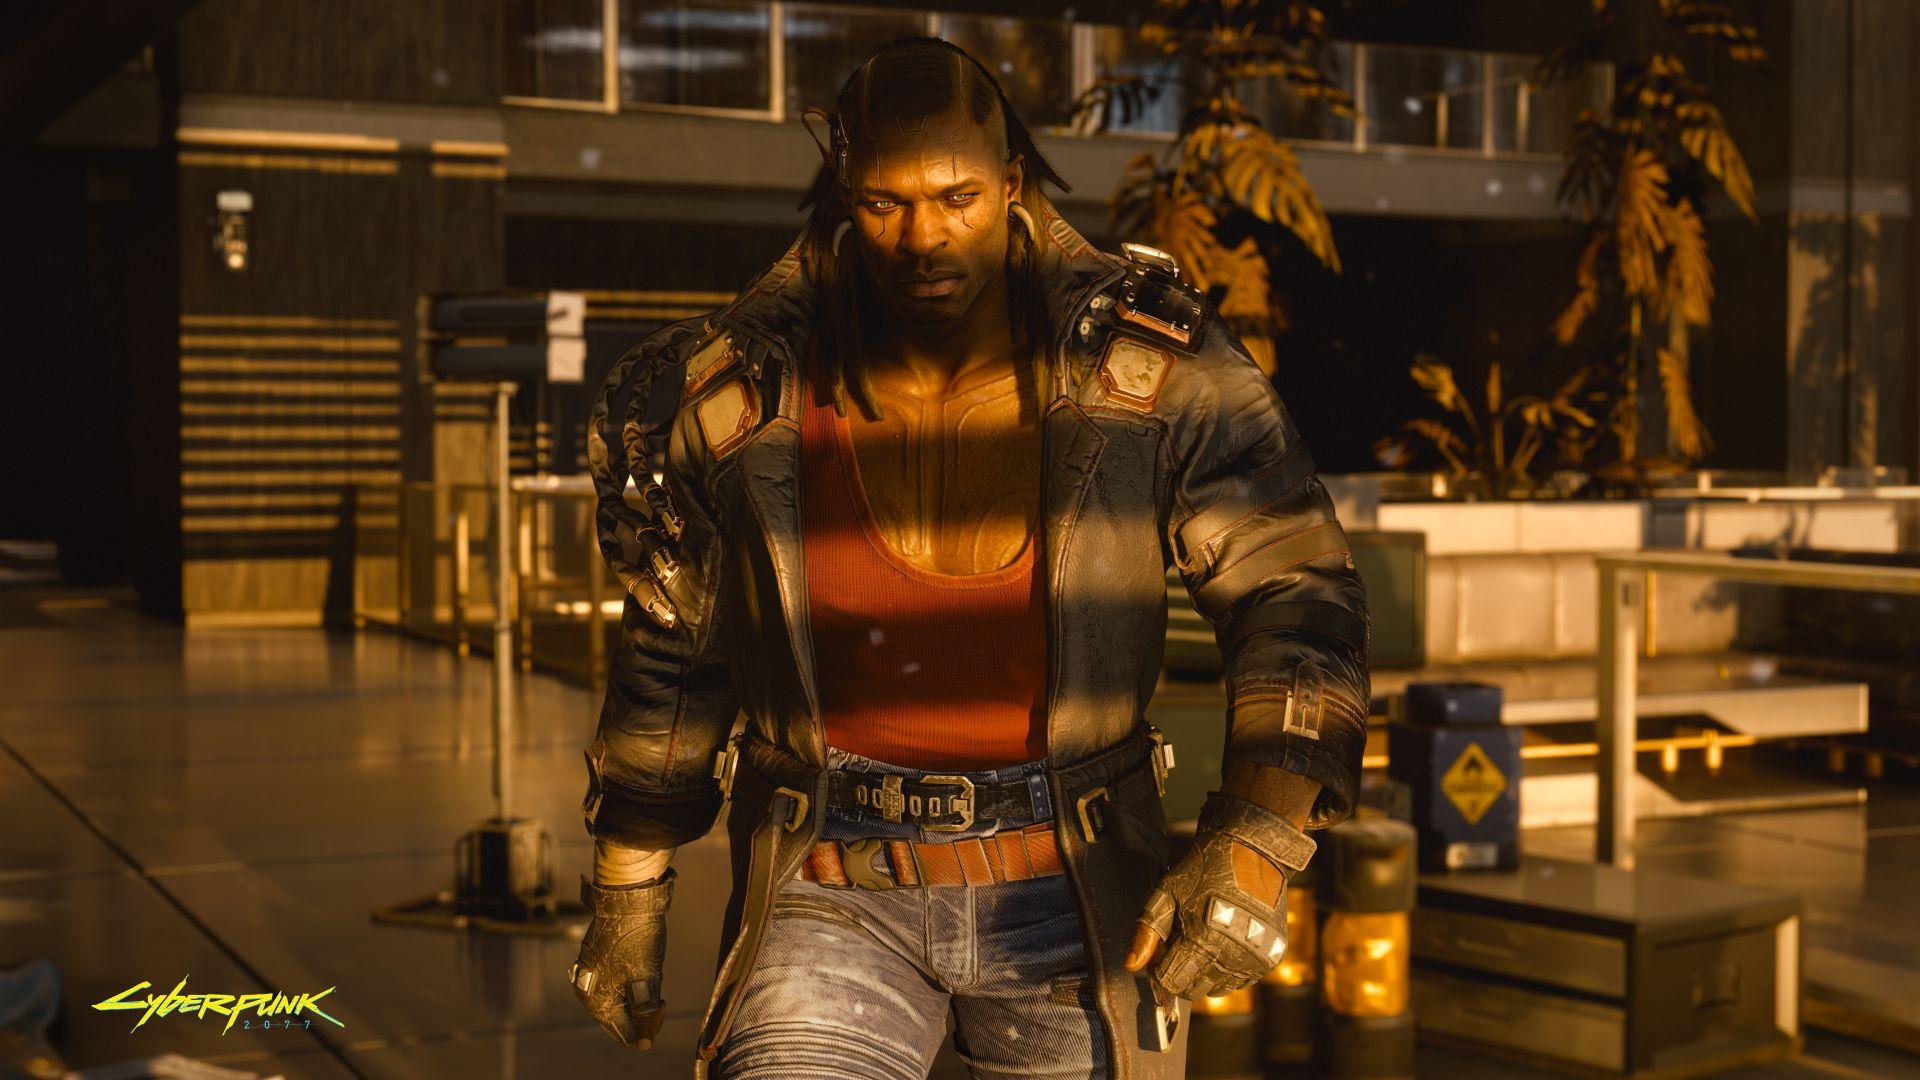 Preview Cyberpunk 2077 Cyberpunk2077 Nice coat RGB en